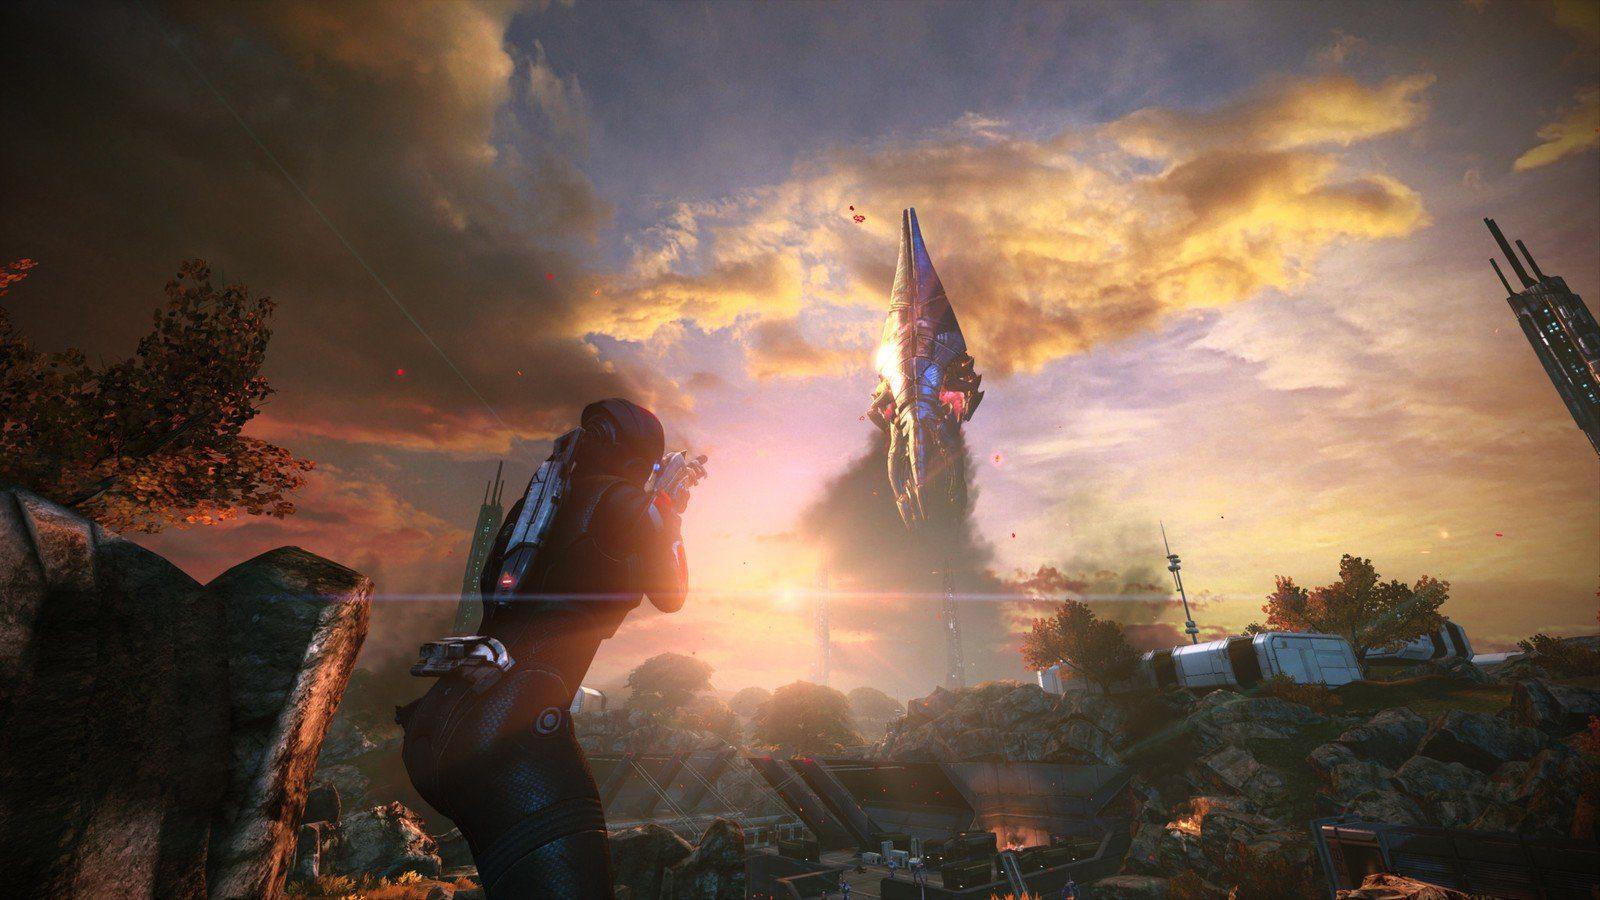 A Reaper taking off in Mass Effect